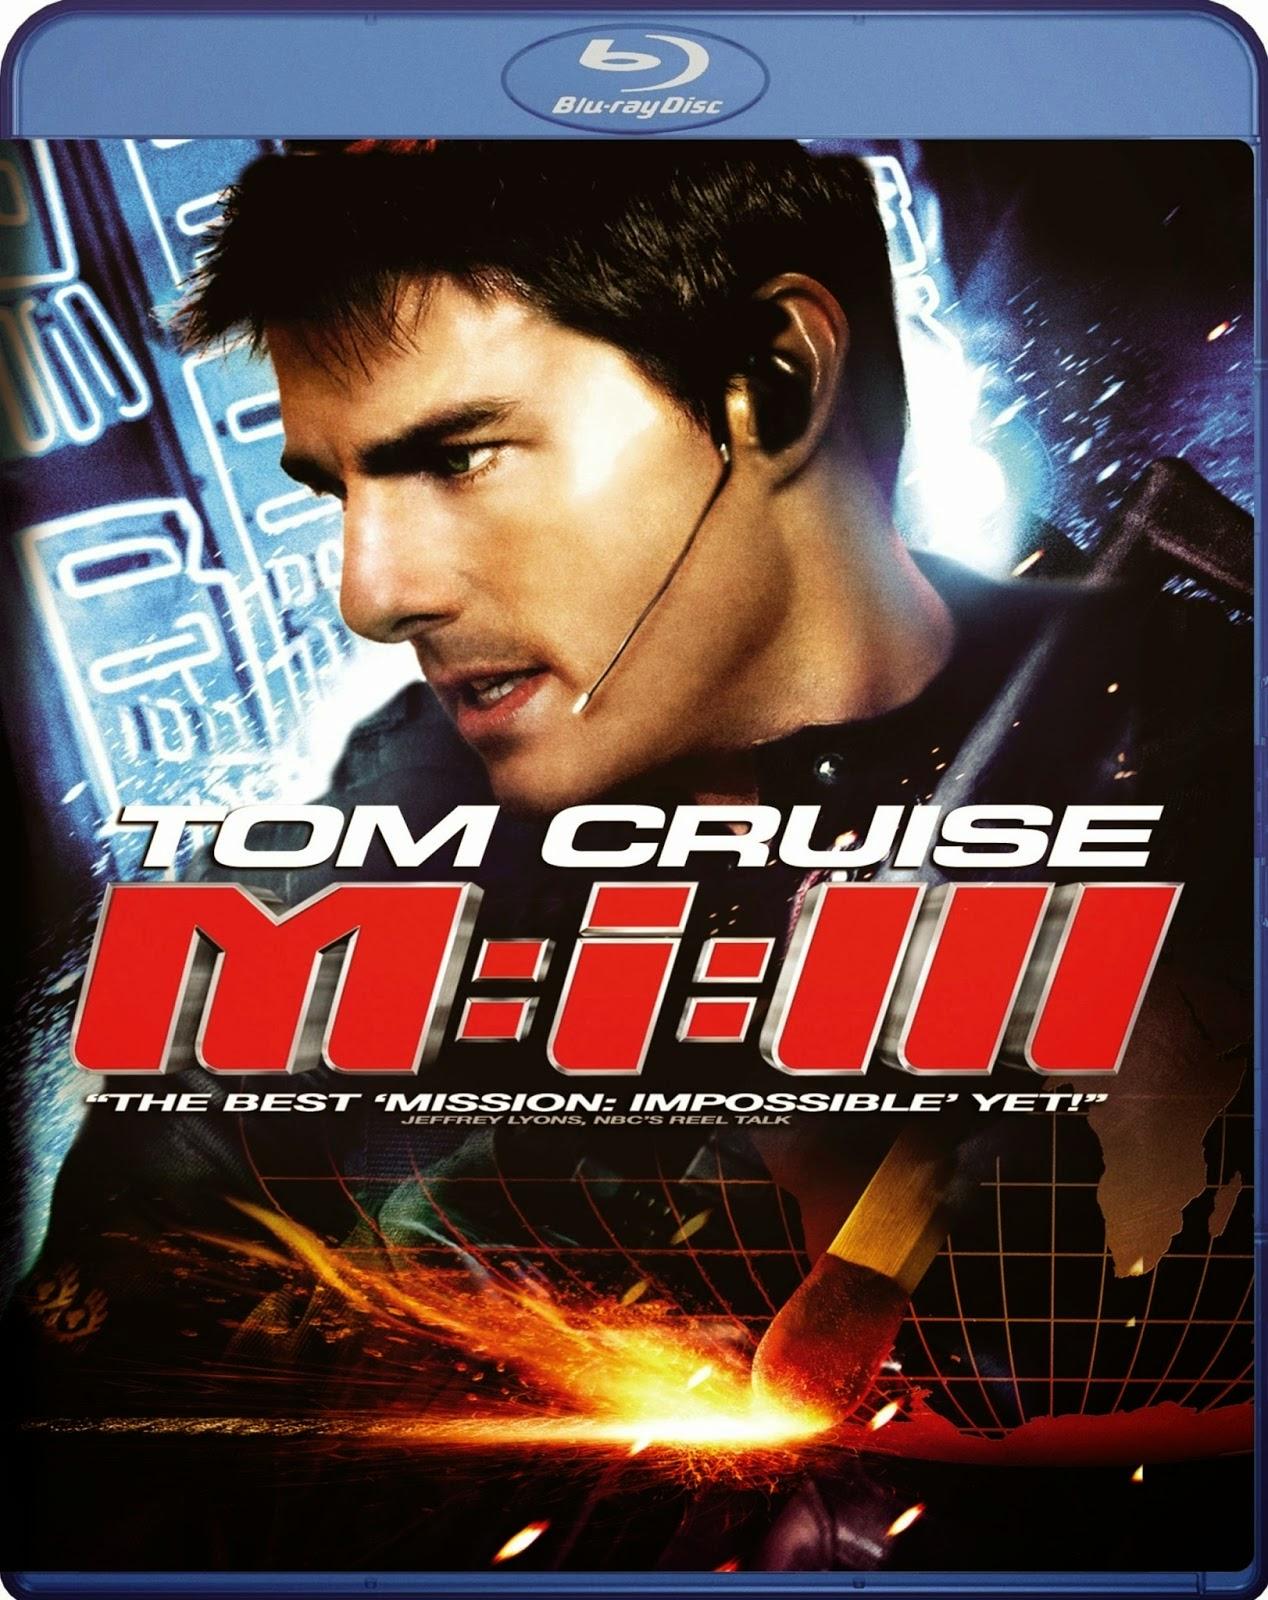 Mission: Impossible 3 2006 มิชชั่นอิมพอสซิเบิ้ล